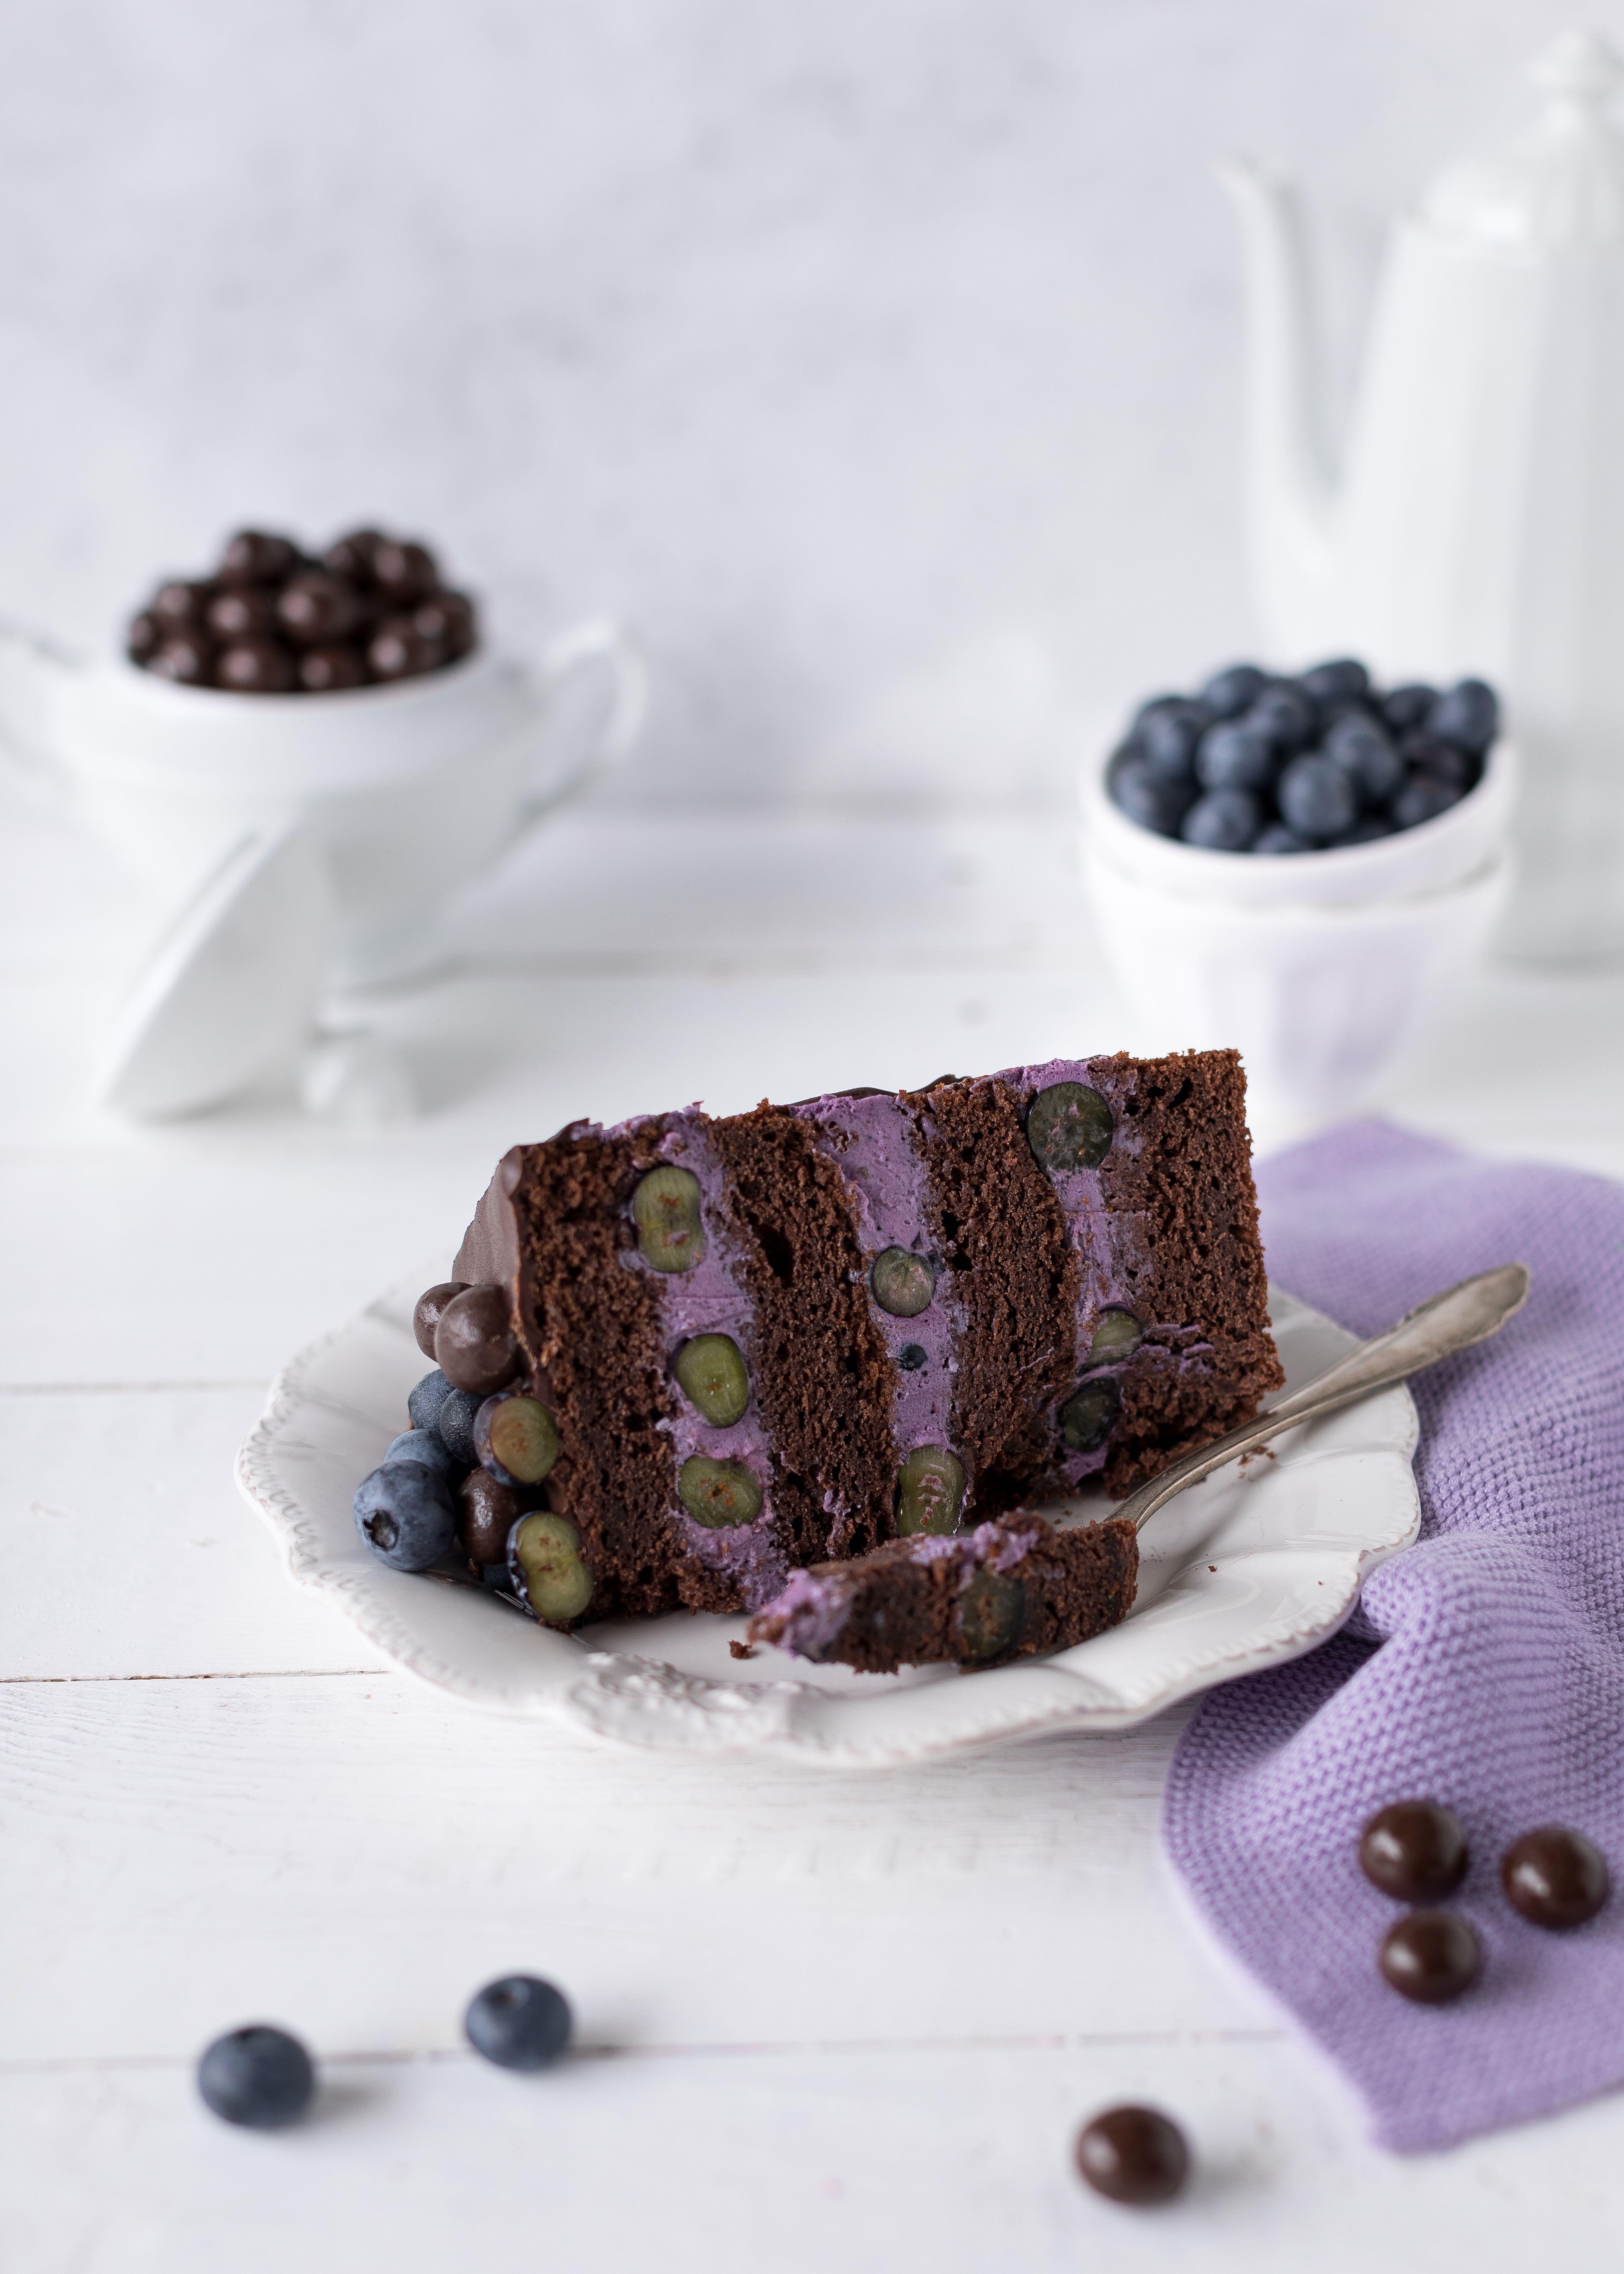 Blaubeer Schoko Layer Cake Rezept Torte Drip Cake backen Schokolade Blaubeere Heidelbeeren #dripcake #layercake #chocolate #schokolade #torte | Emma´s Lieblingsstücke